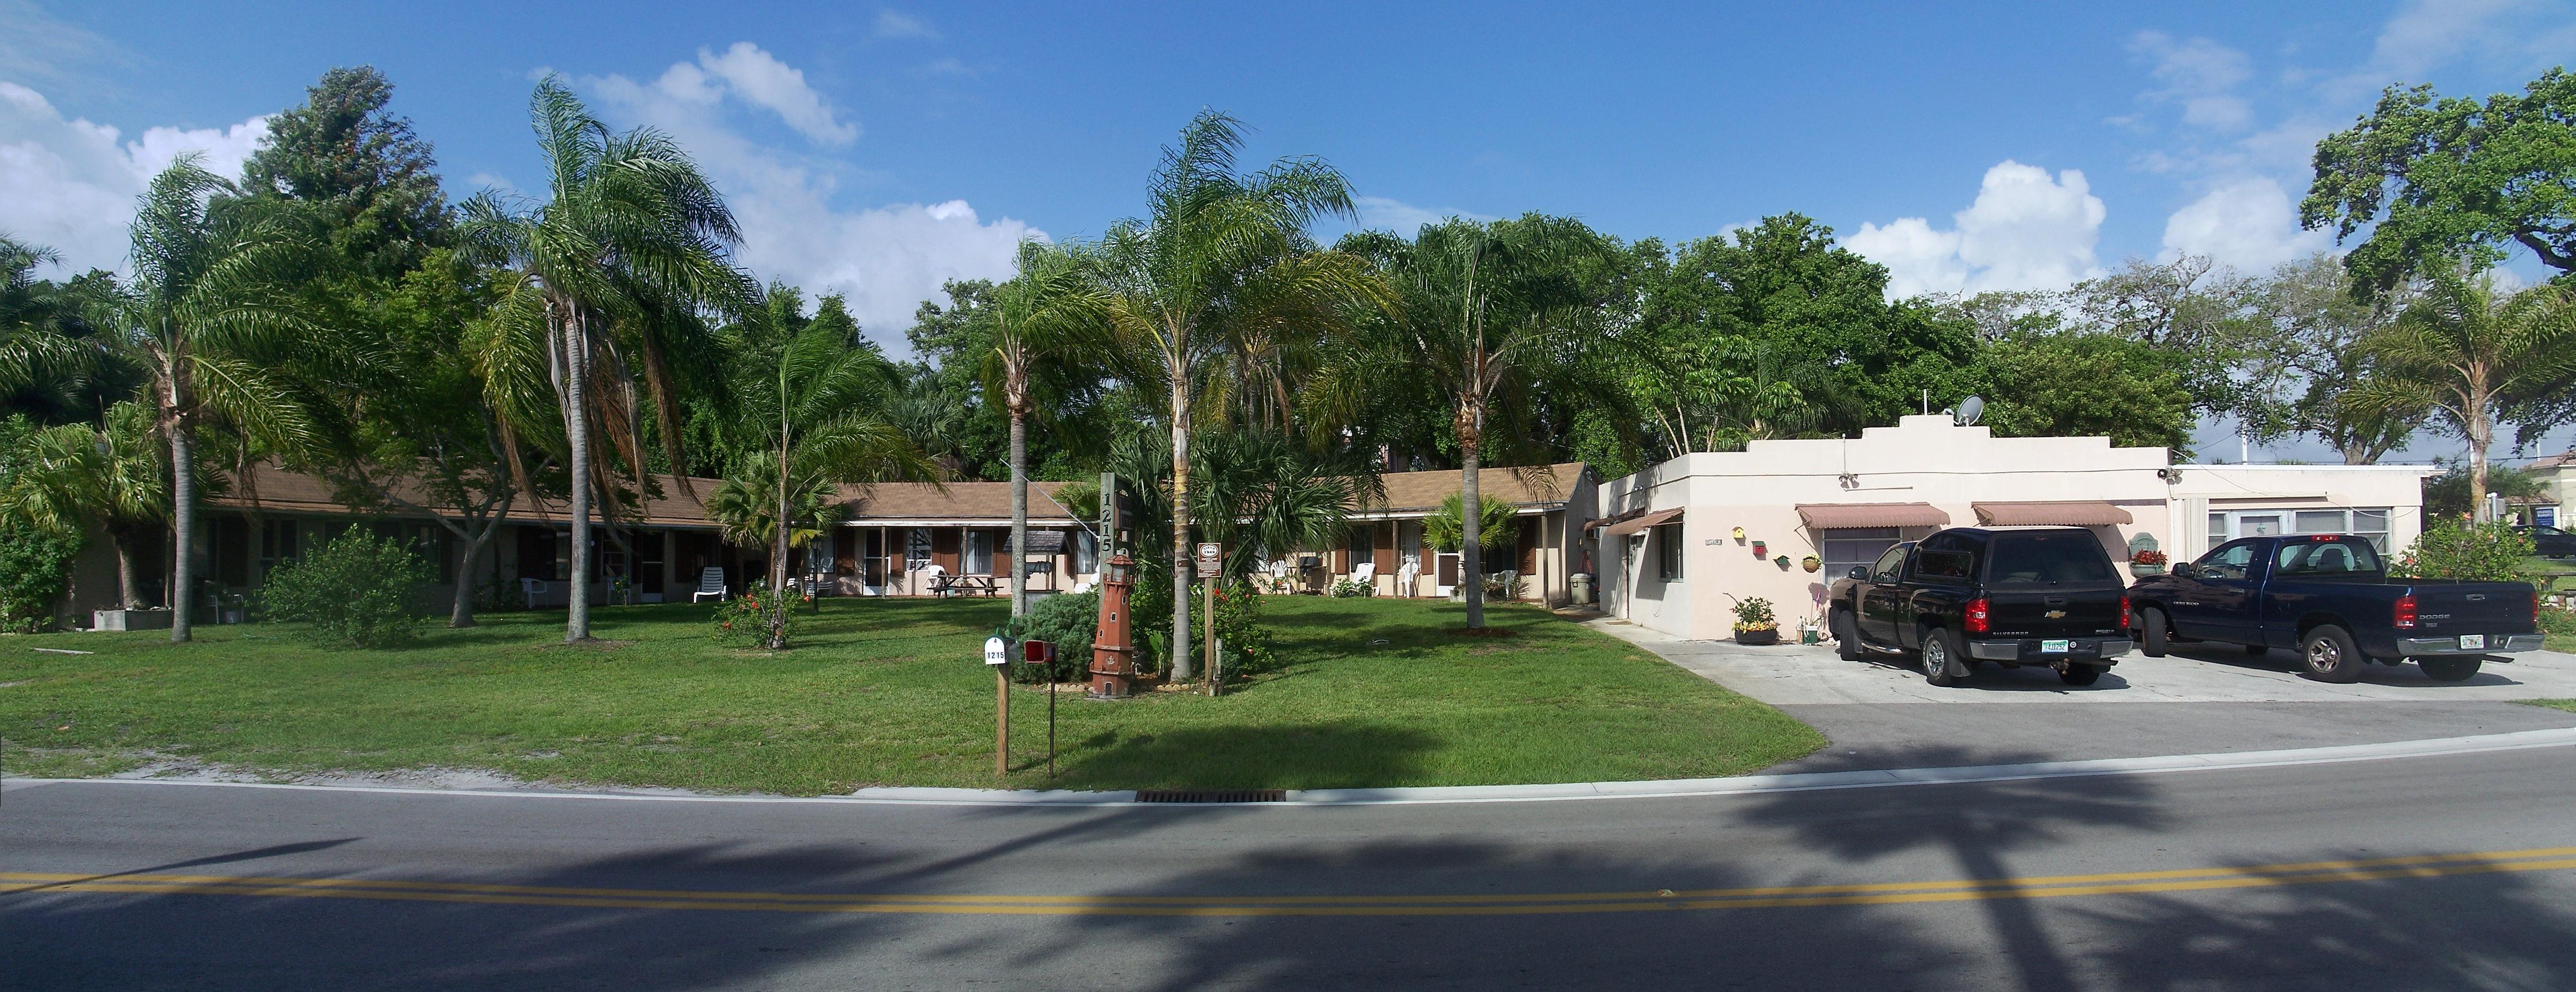 File:Sebastian FL East HD Harbor Light Motel Pano01 Gallery